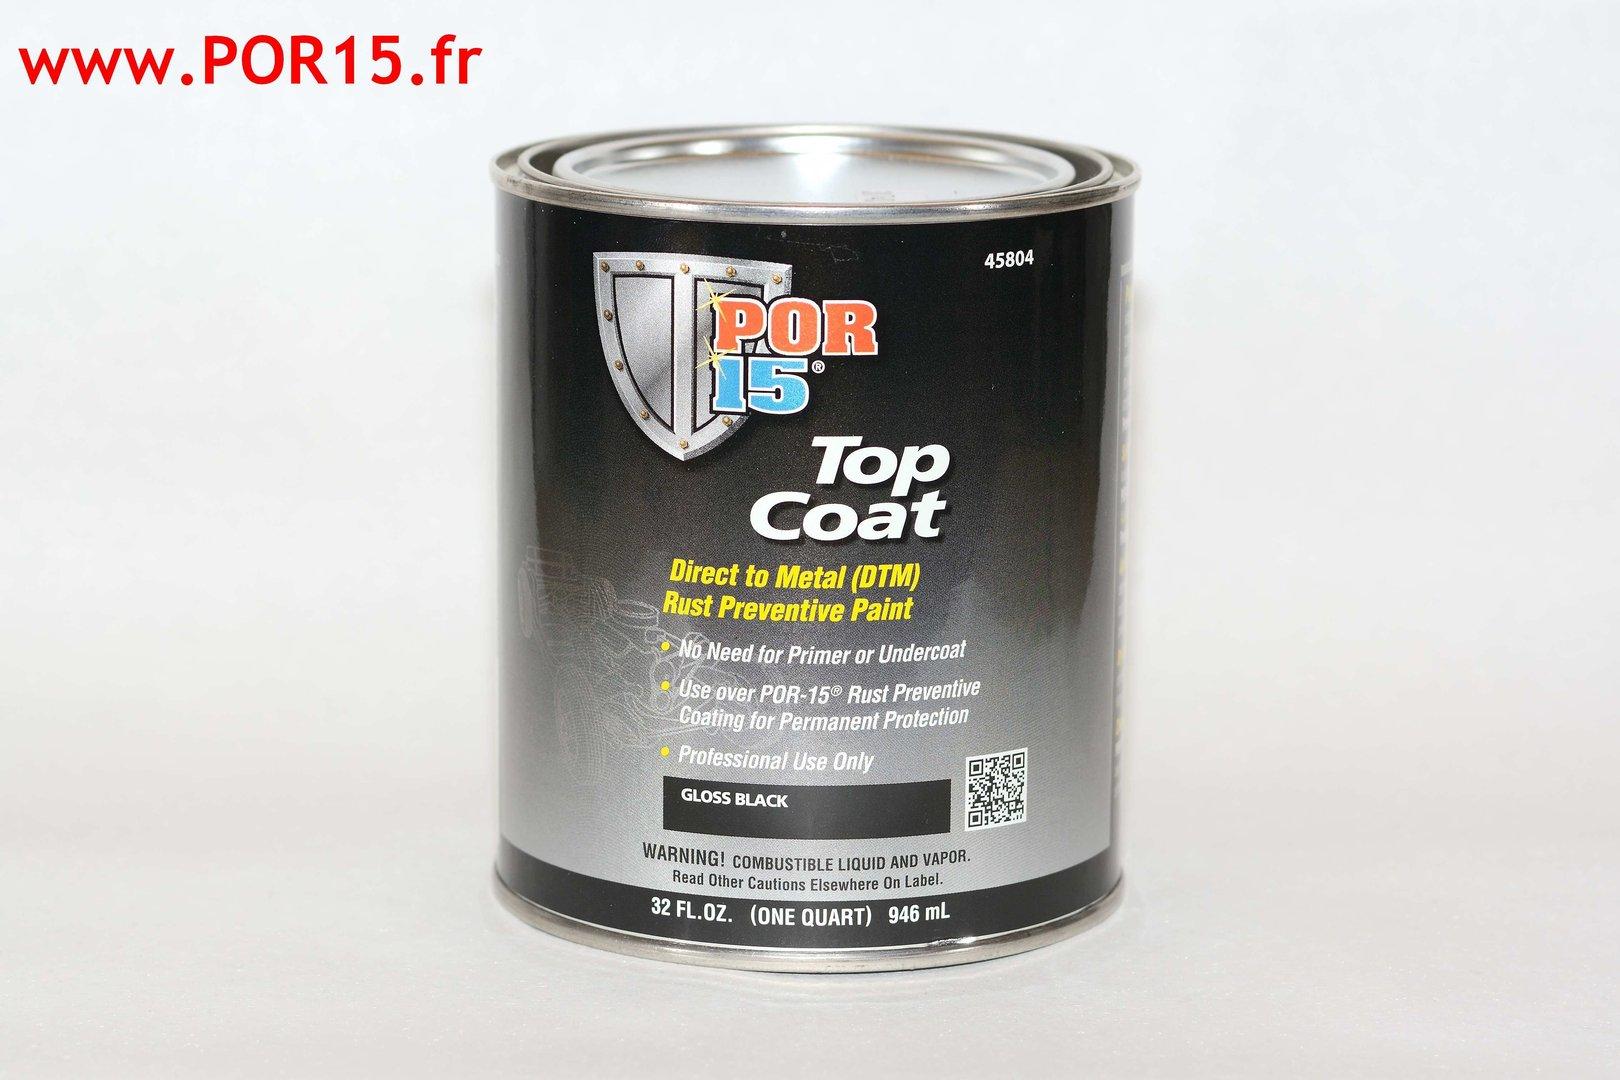 POR15 TOP COAT GLOSS BLACK SIXPACK (6x 113 ml)